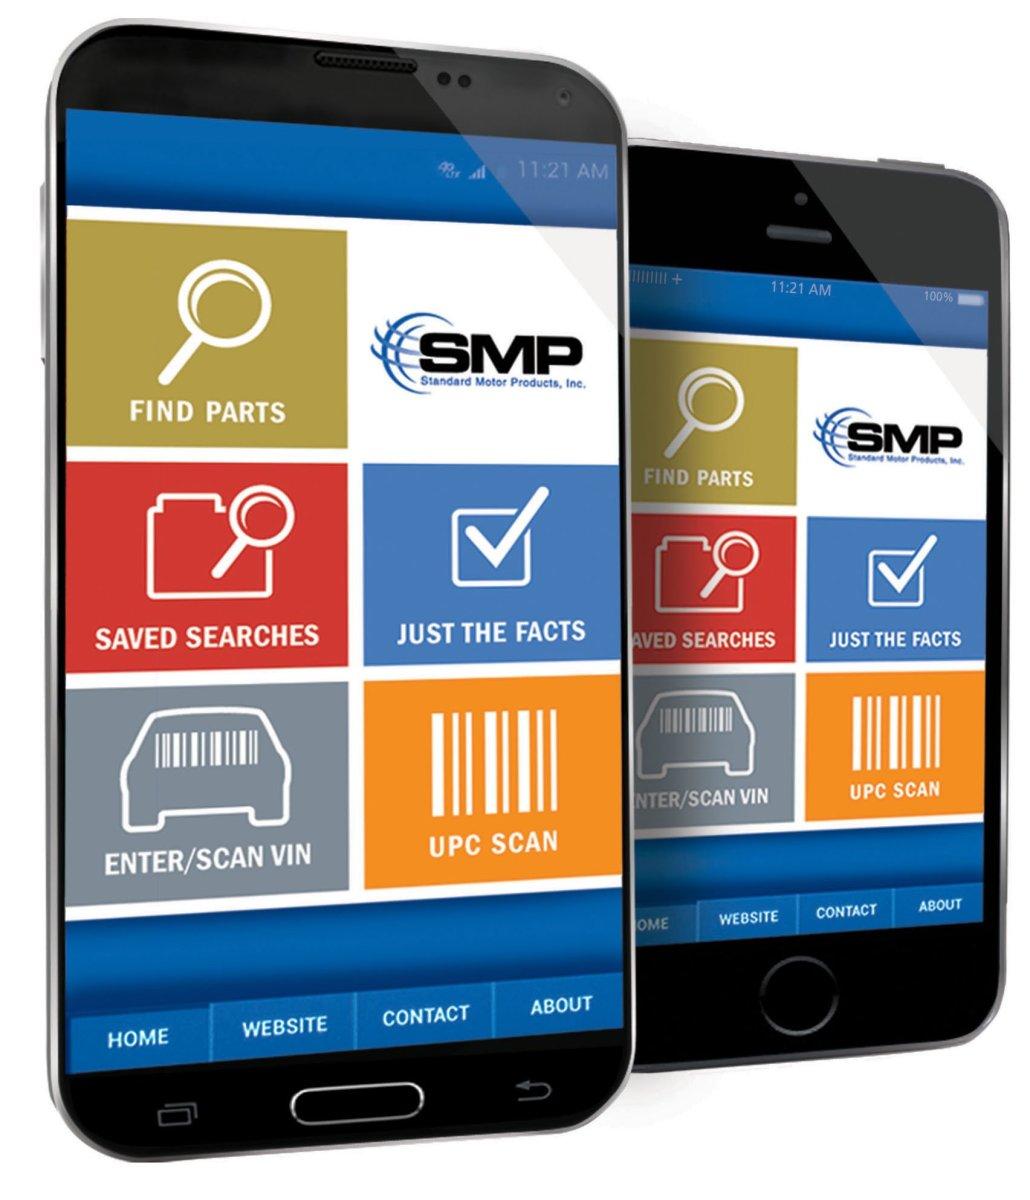 SMP app,find parts